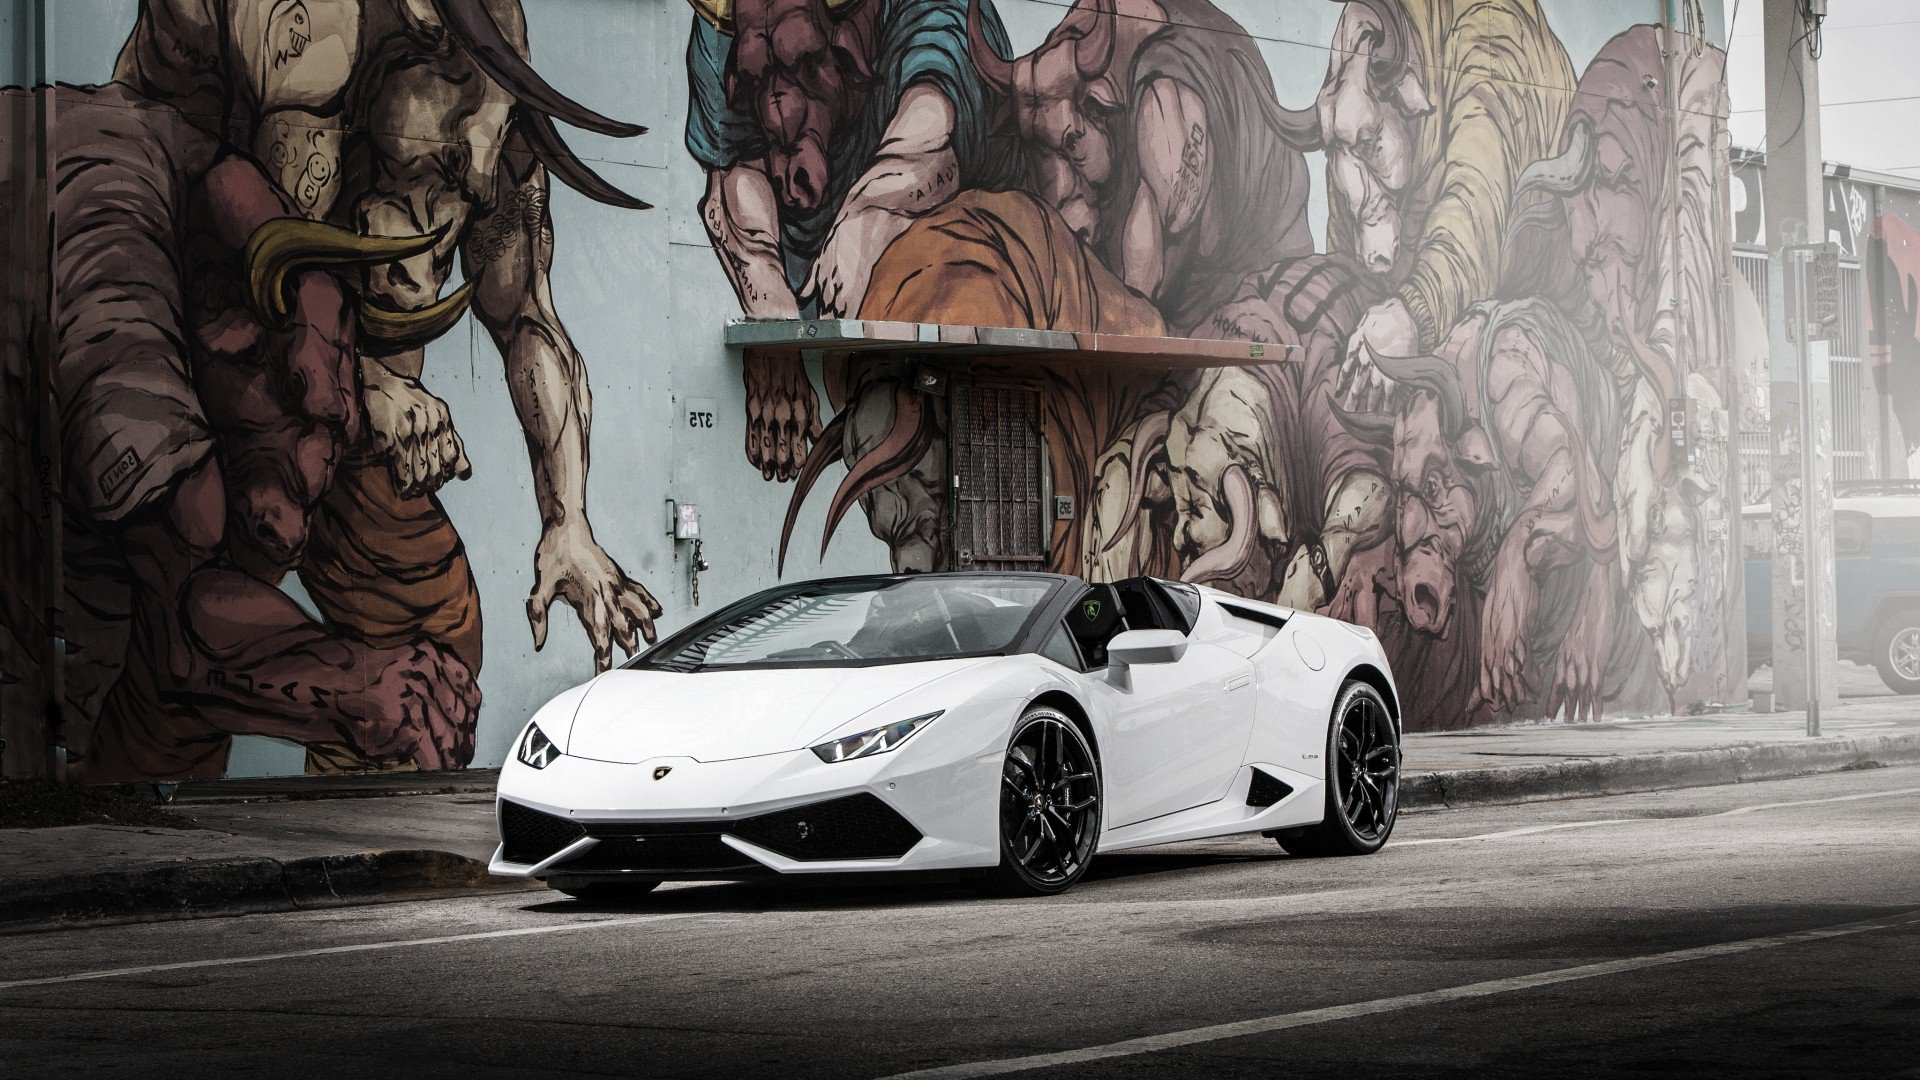 2048x2048 Anthem Ipad Air Hd 4k Wallpapers Images: 2048x2048 Lamborghini Huracan White Ipad Air HD 4k